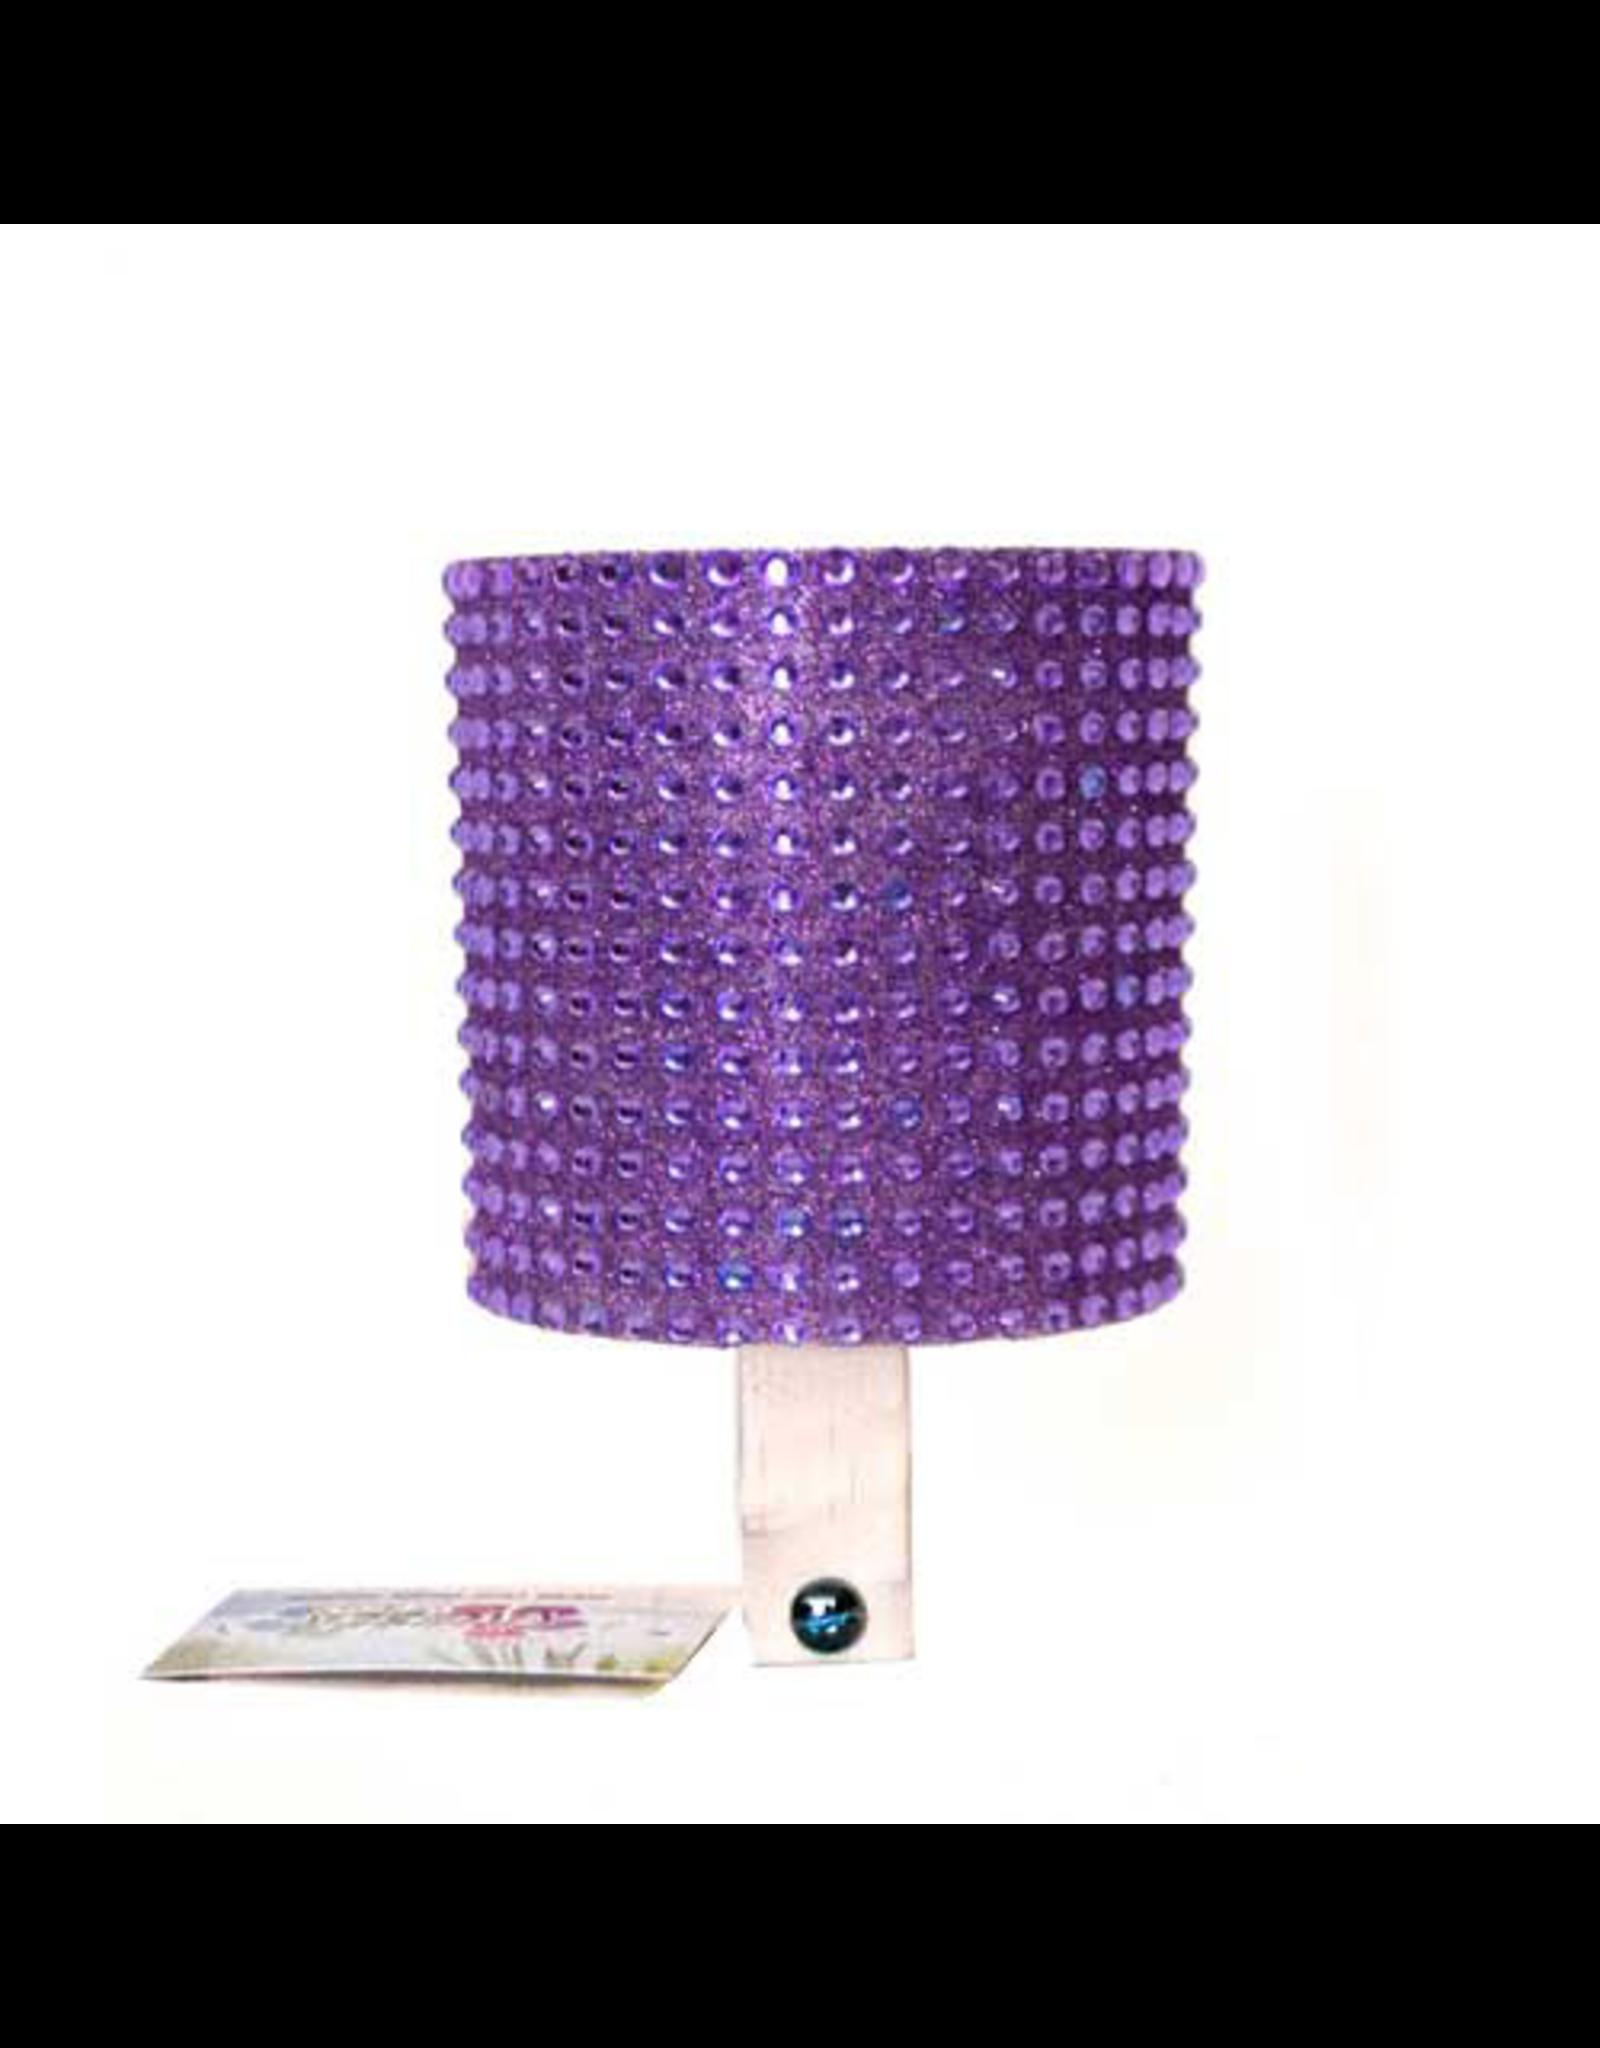 Cruiser Candy Cruiser Candy Rhinestone Drink Holder - Purple